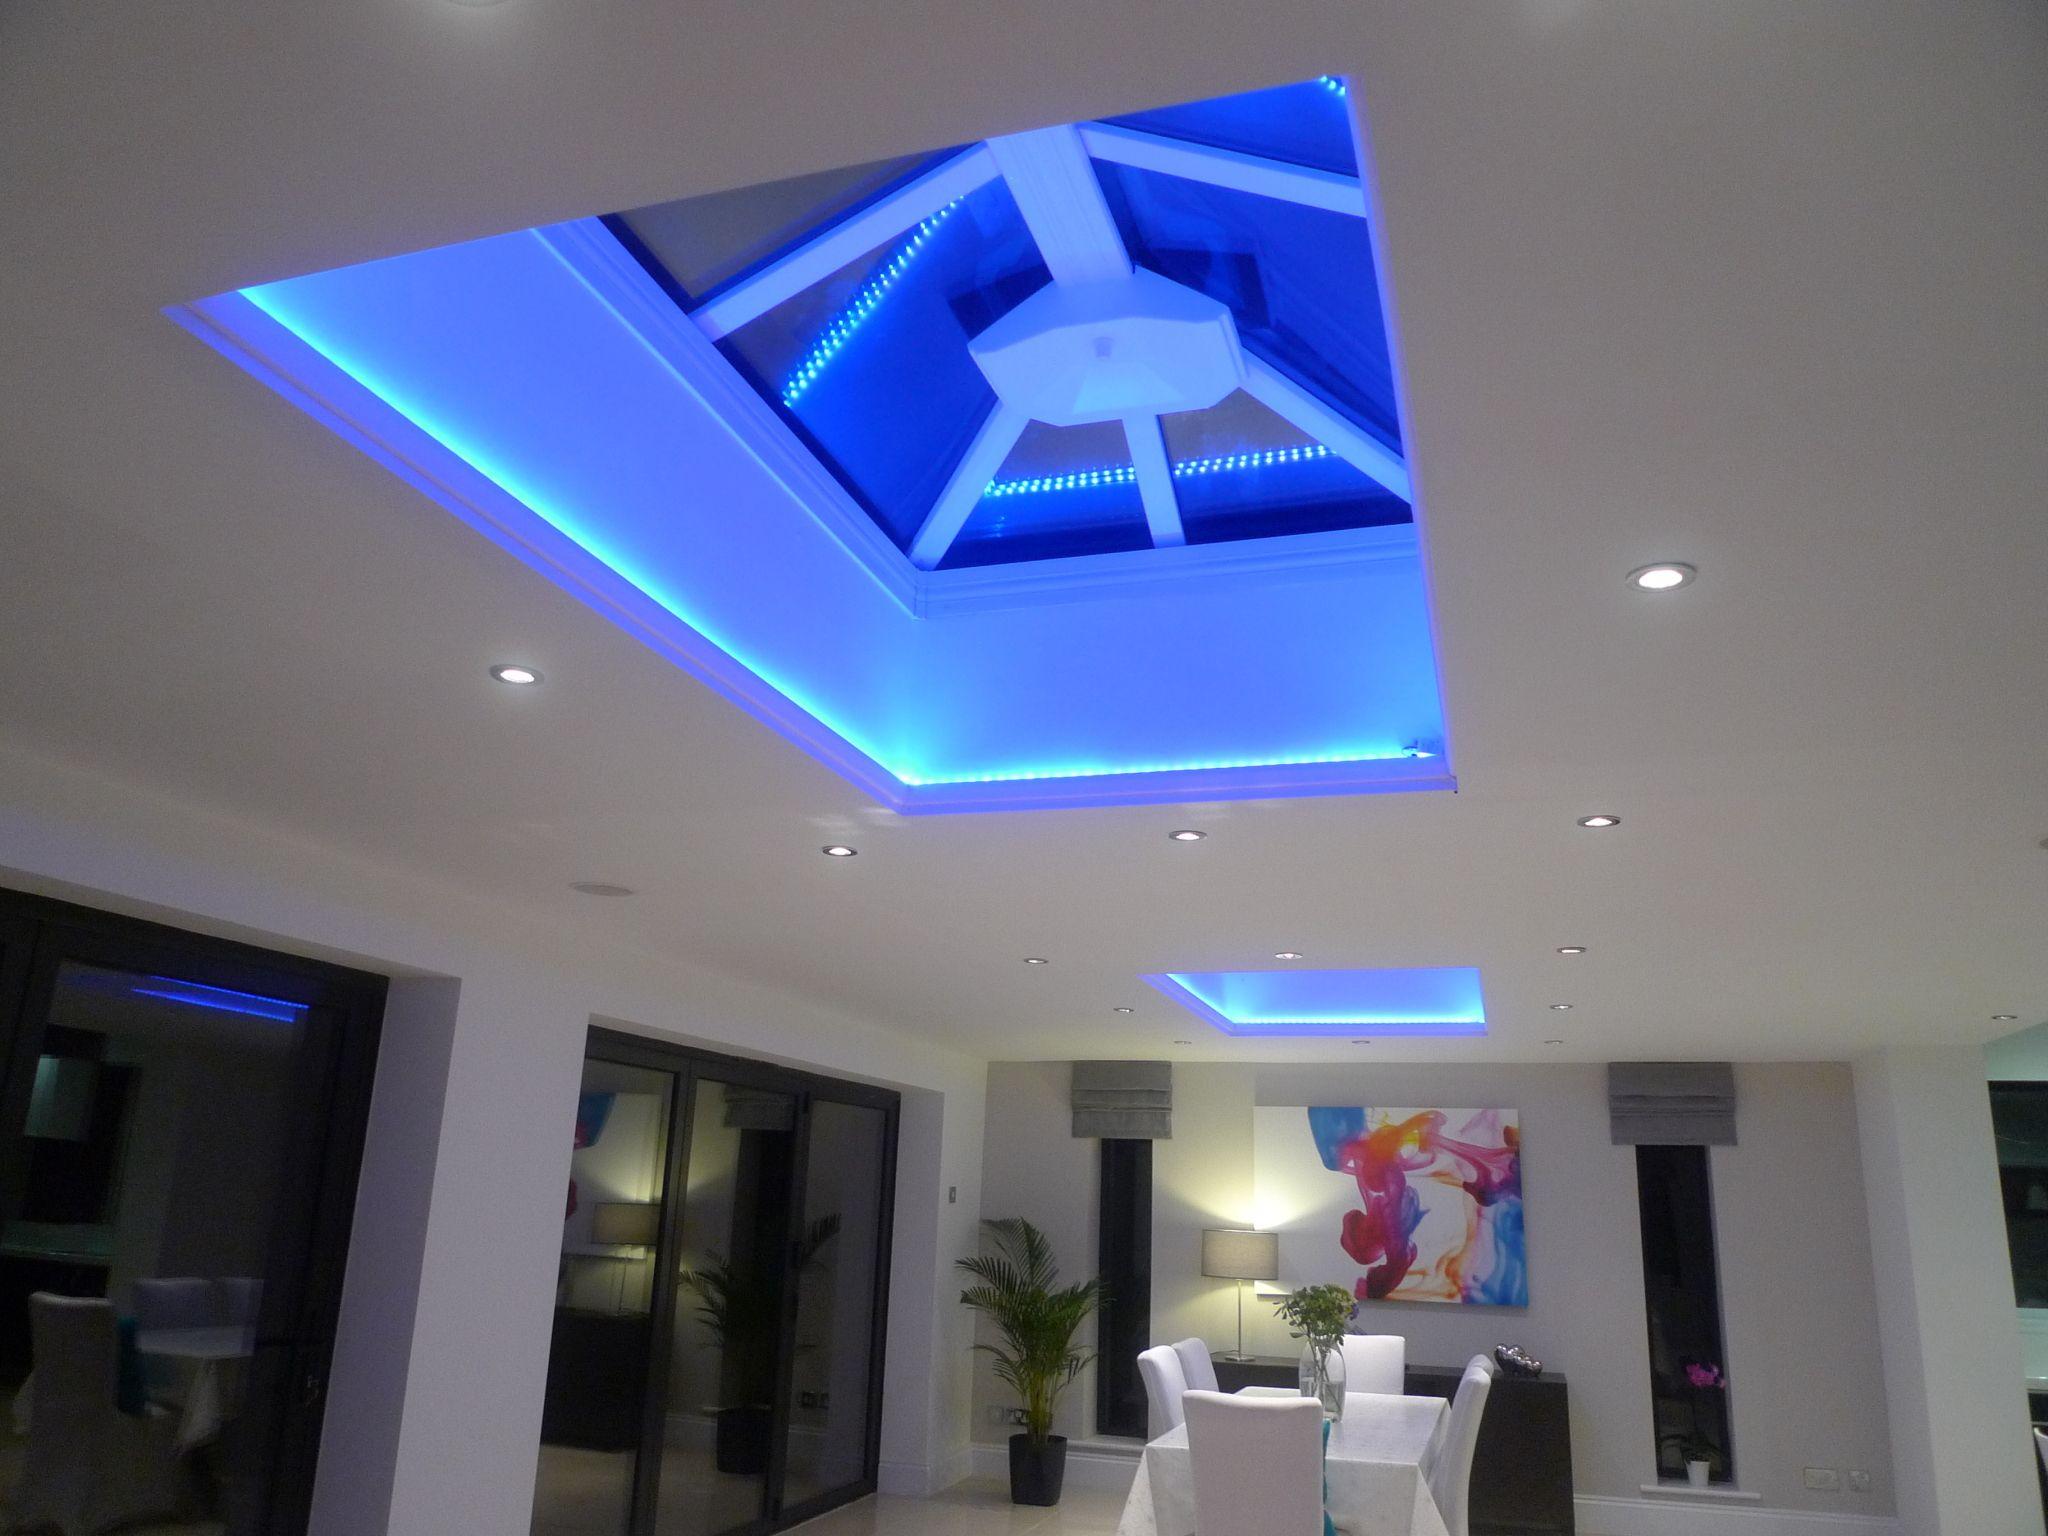 conservatory lighting ideas. 10m Bi-folding Or Patio Door? - Page 2 MoneySavingExpert.com Forums Conservatory Lighting Ideas